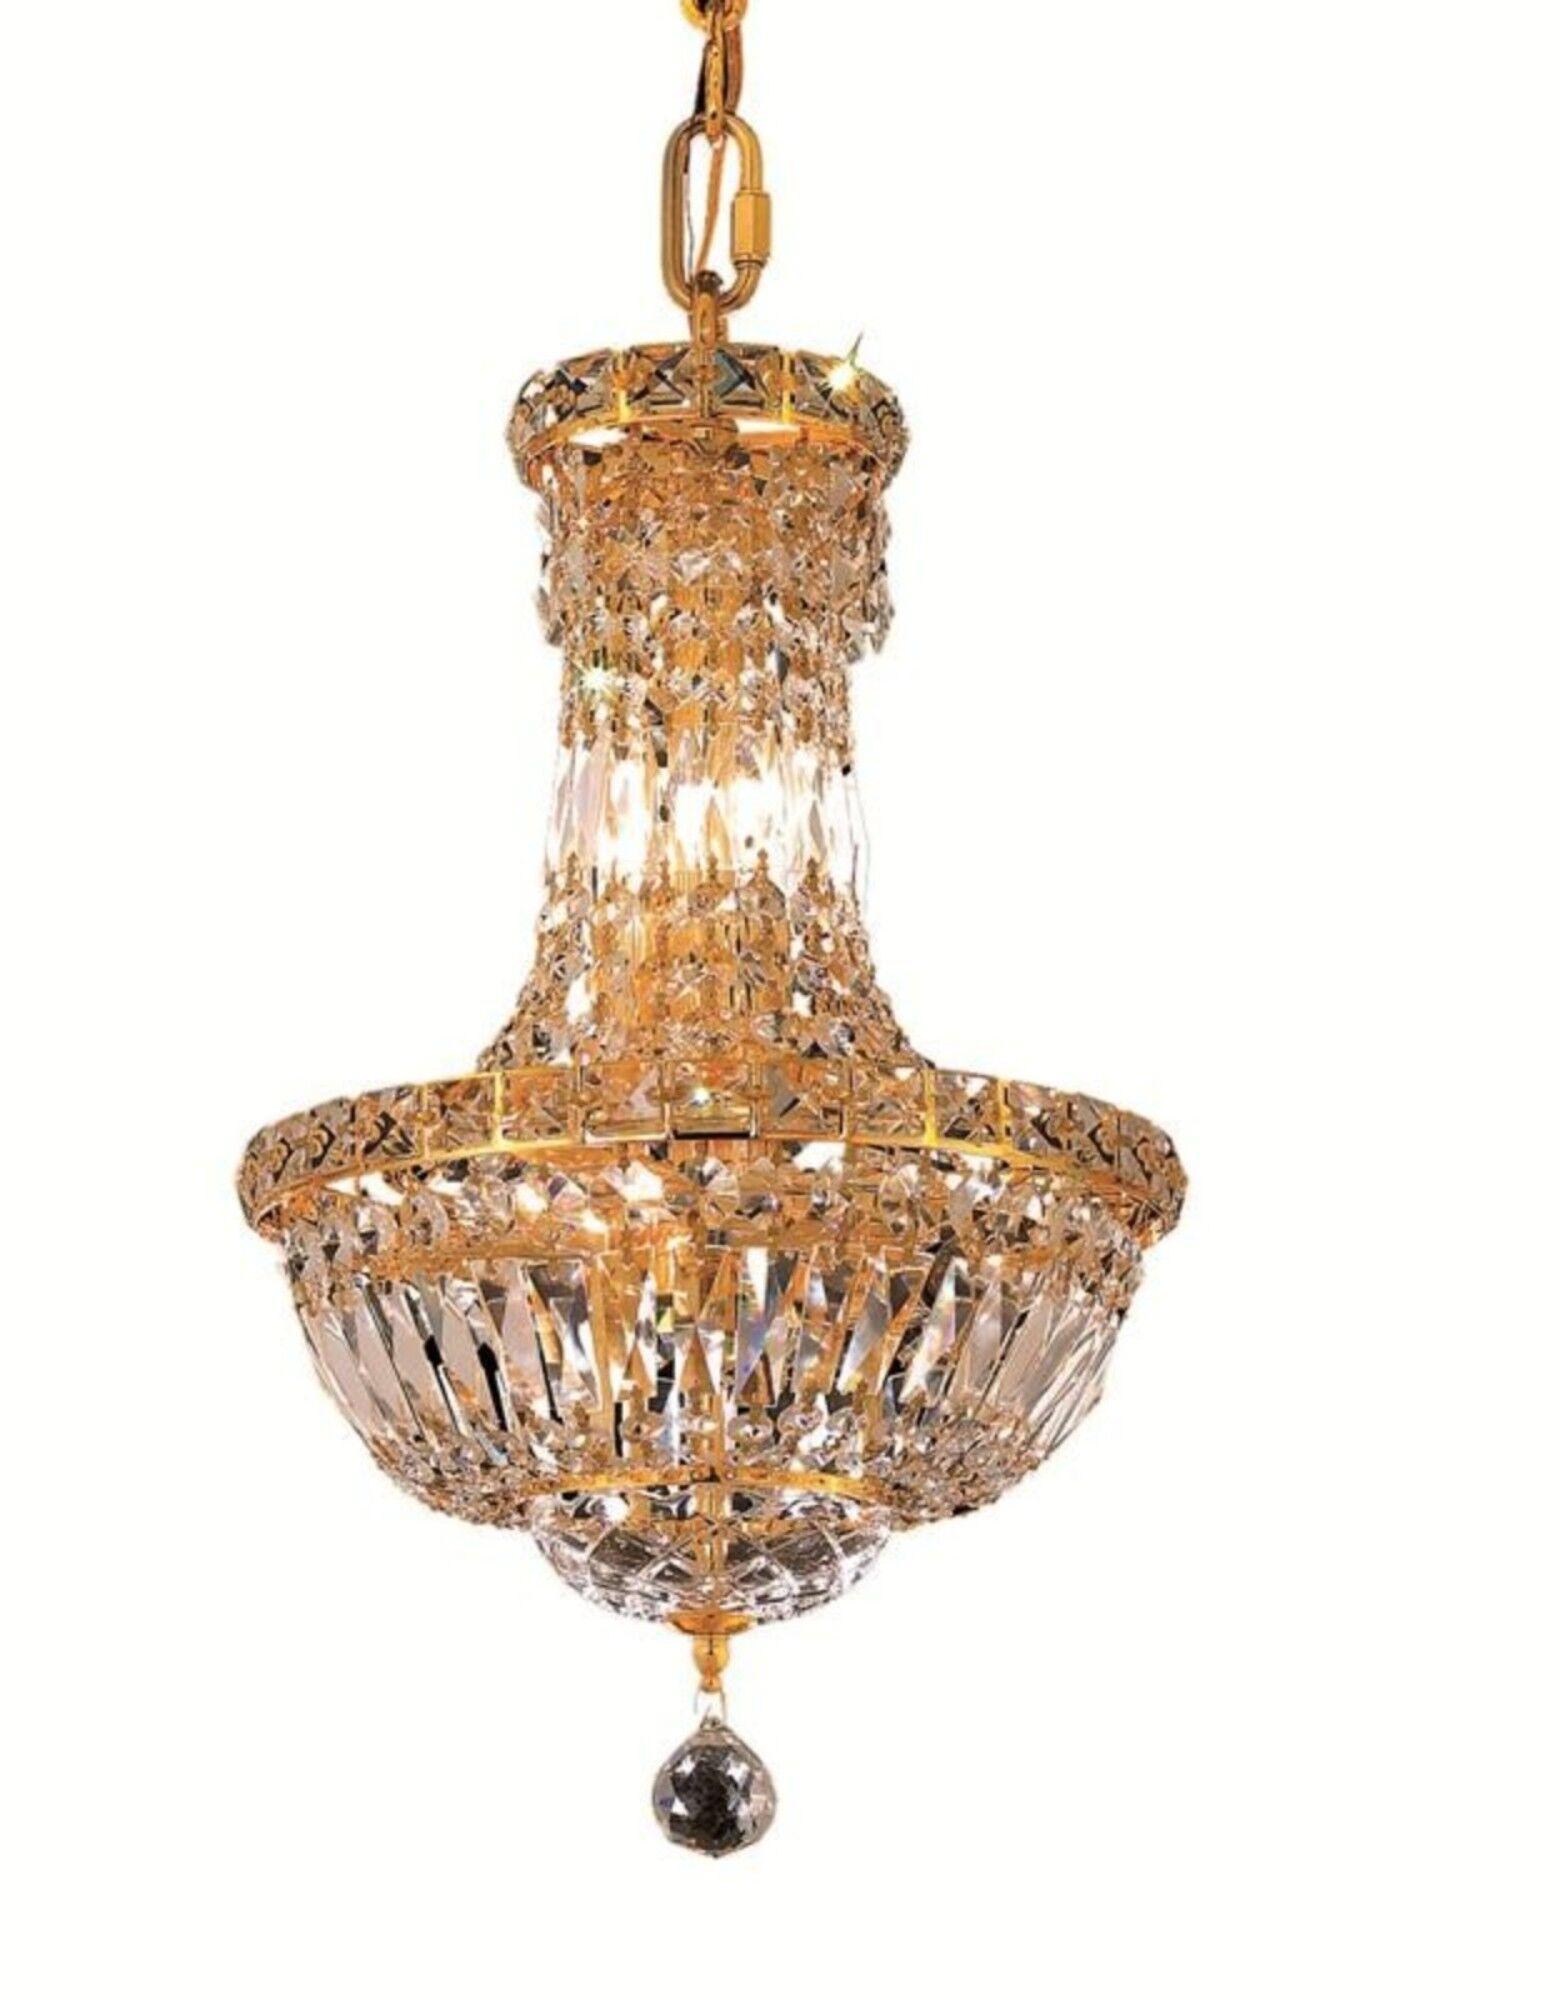 Fulham 6-Light Empire Chandelier Finish: Gold, Crystal: Elegant Cut